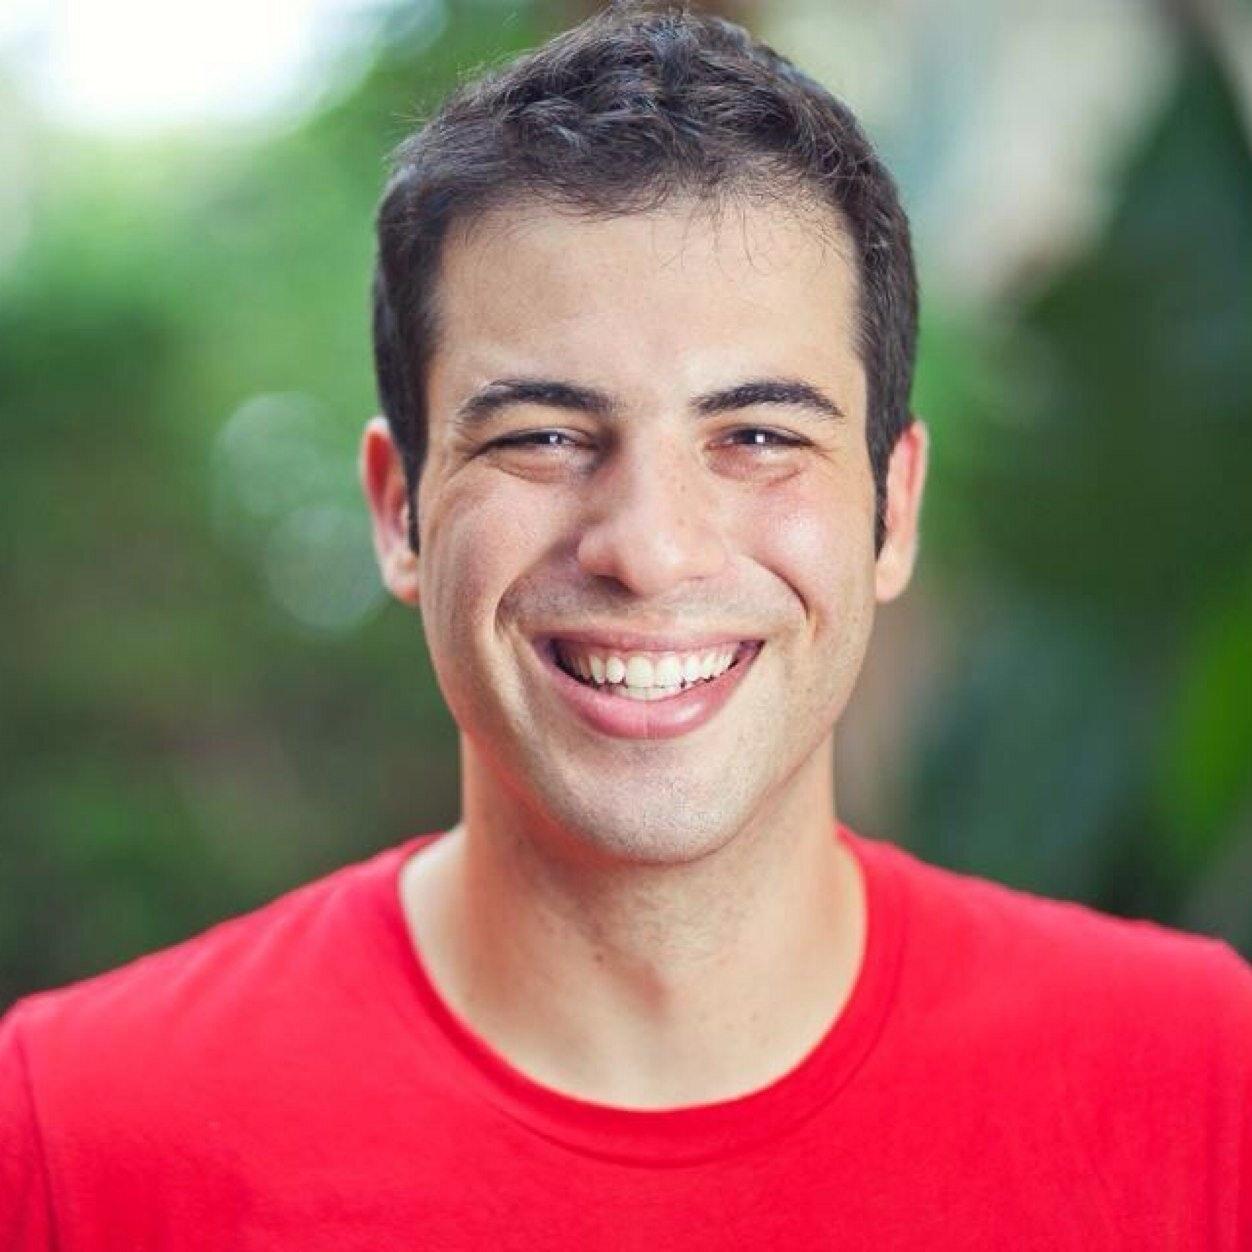 Omer Perchik